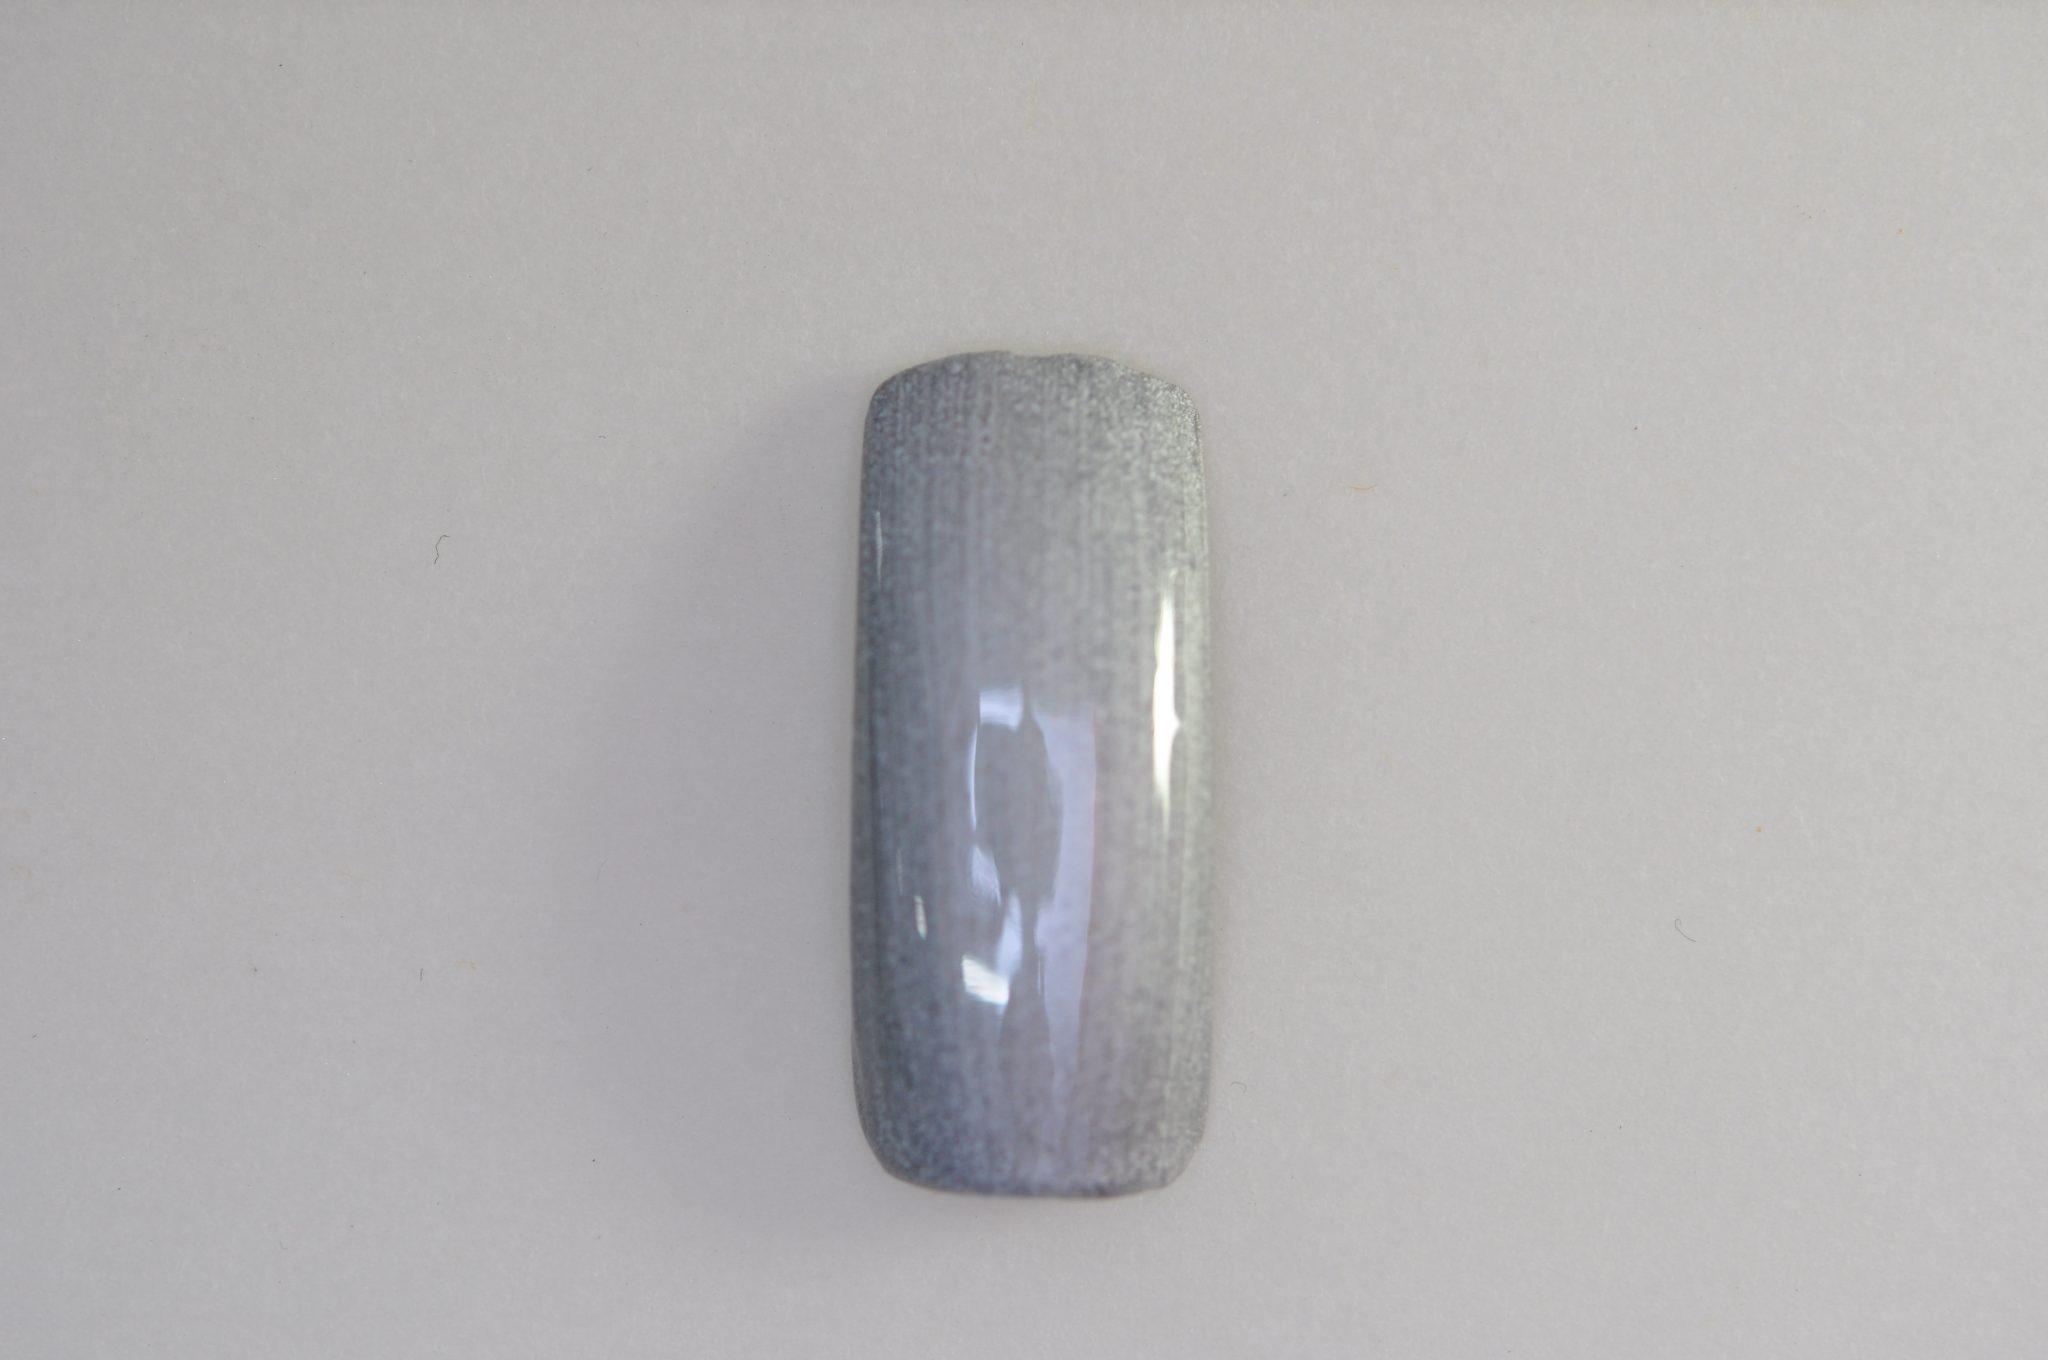 FLOWTY GEL(フローティジェル) Metal Silver